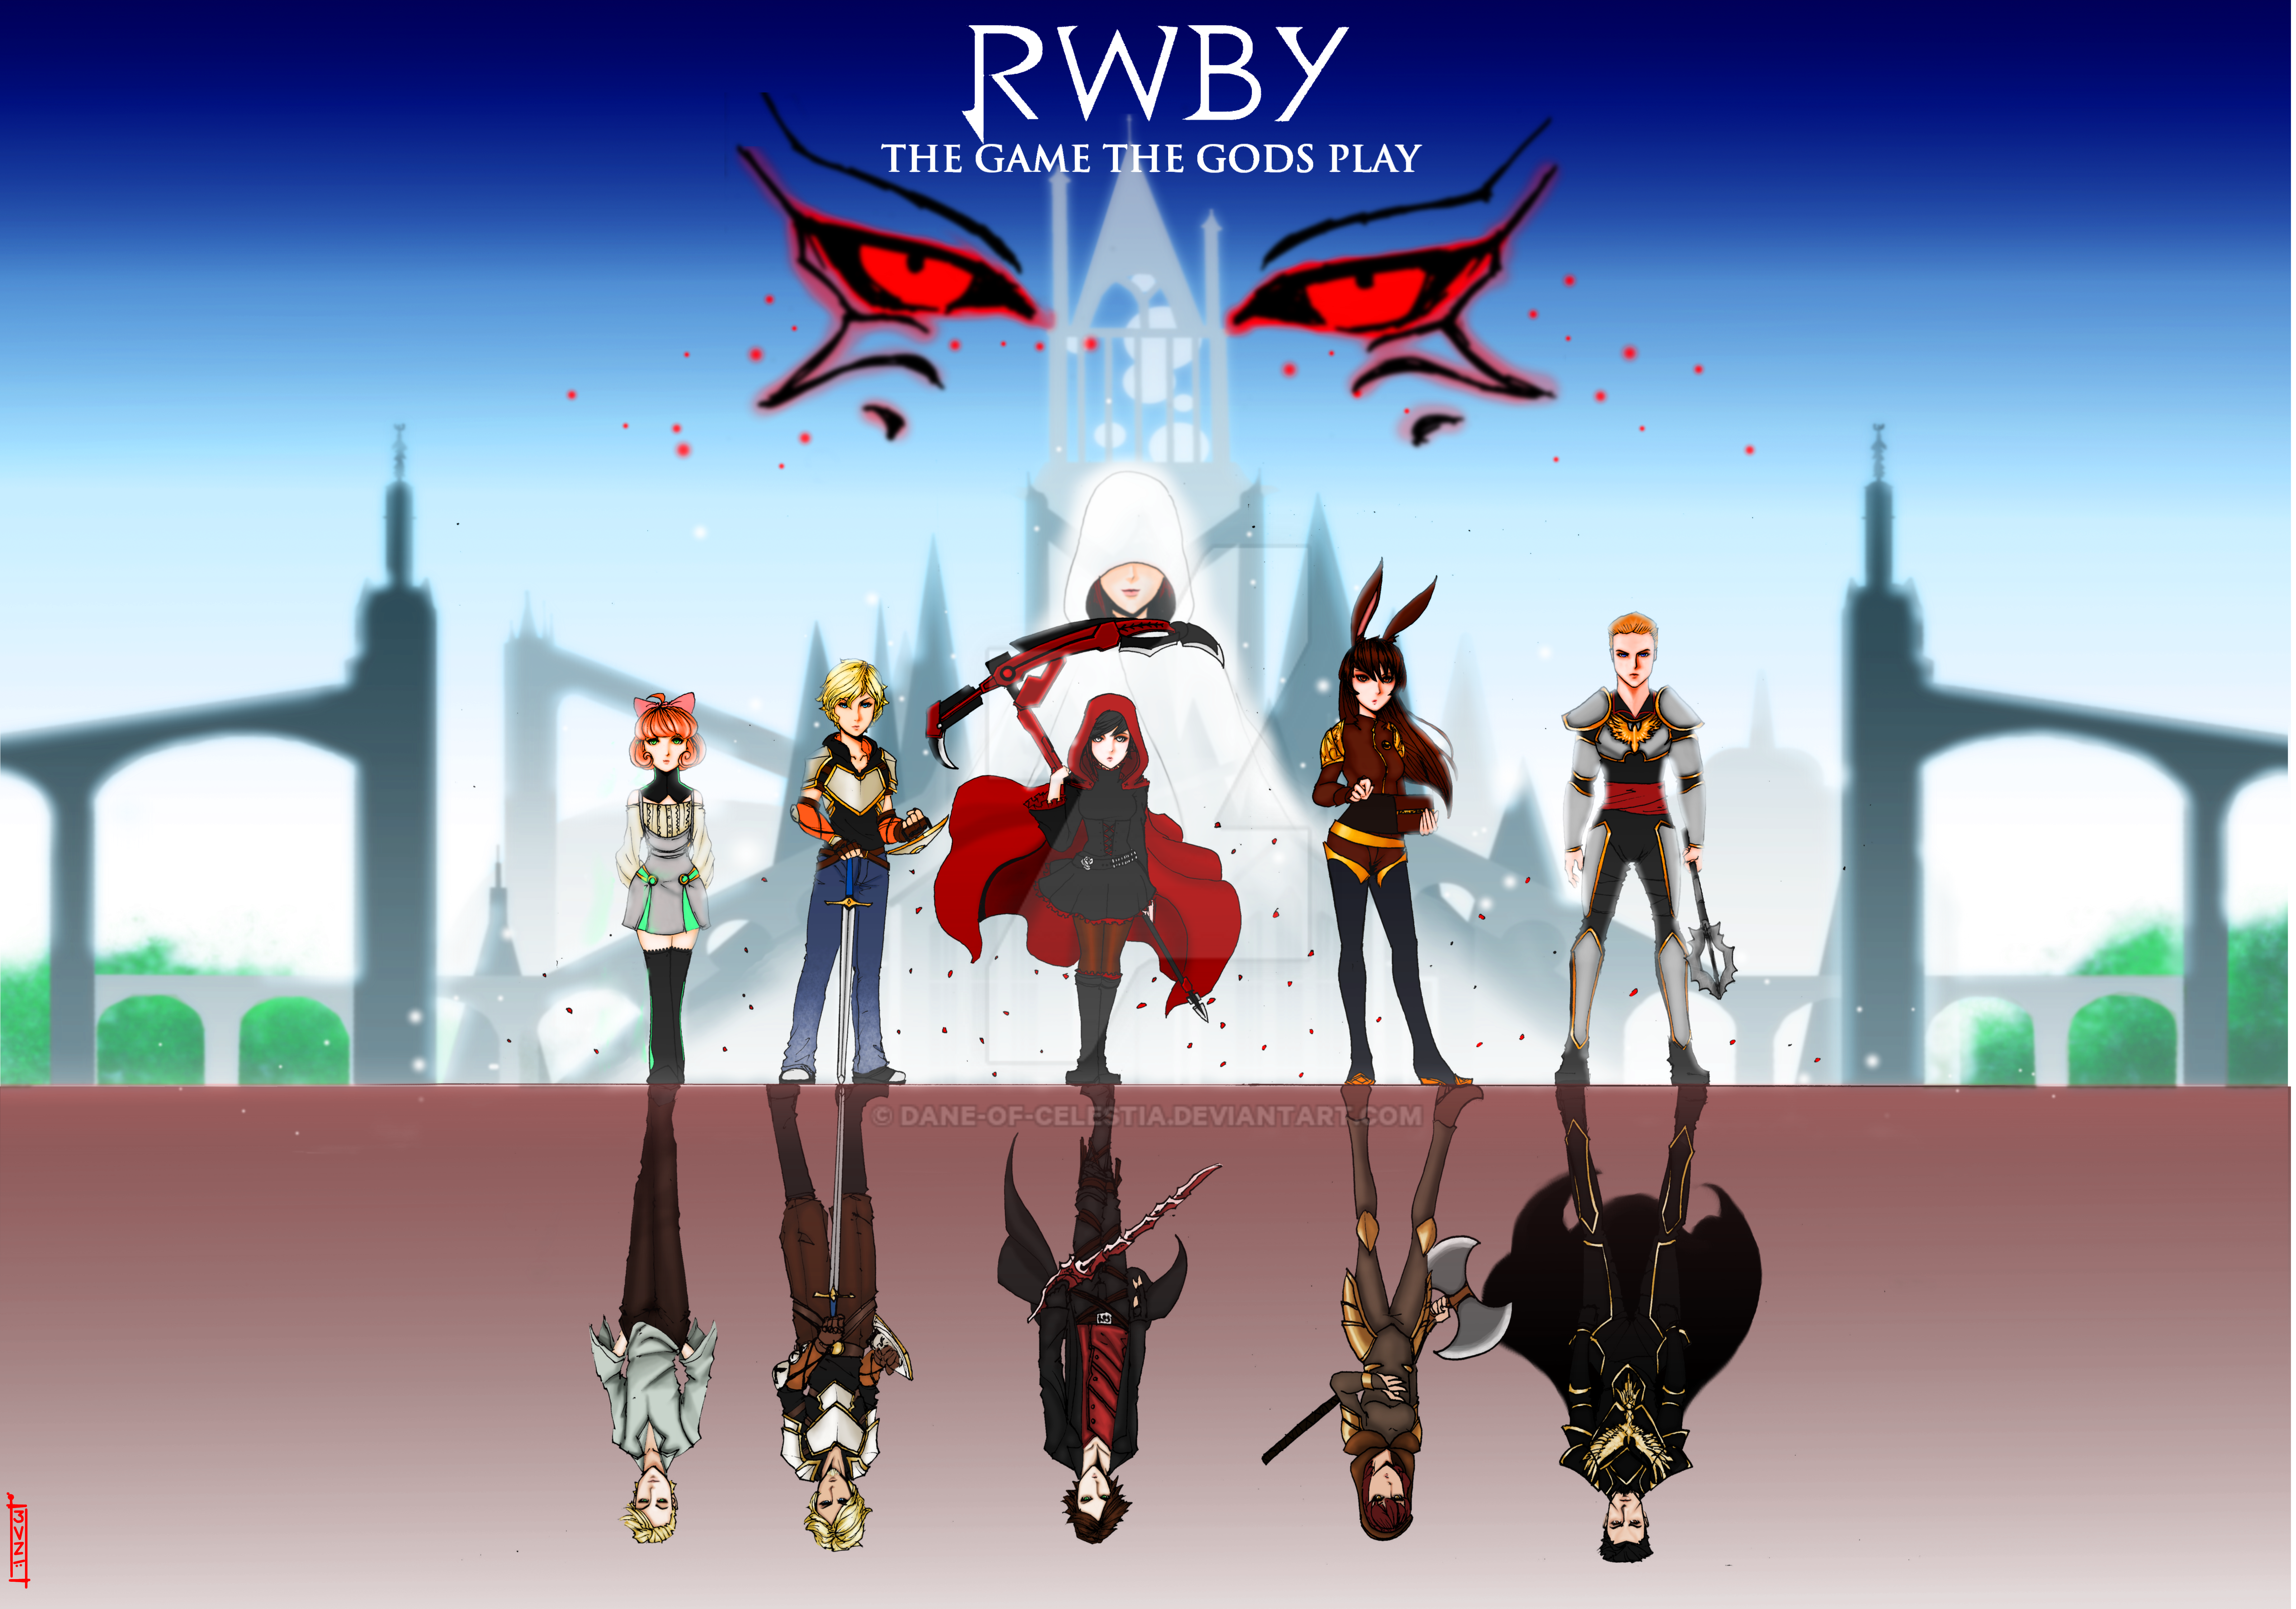 RWBY- The Game The Gods Play by Dane-of-Celestia on DeviantArt